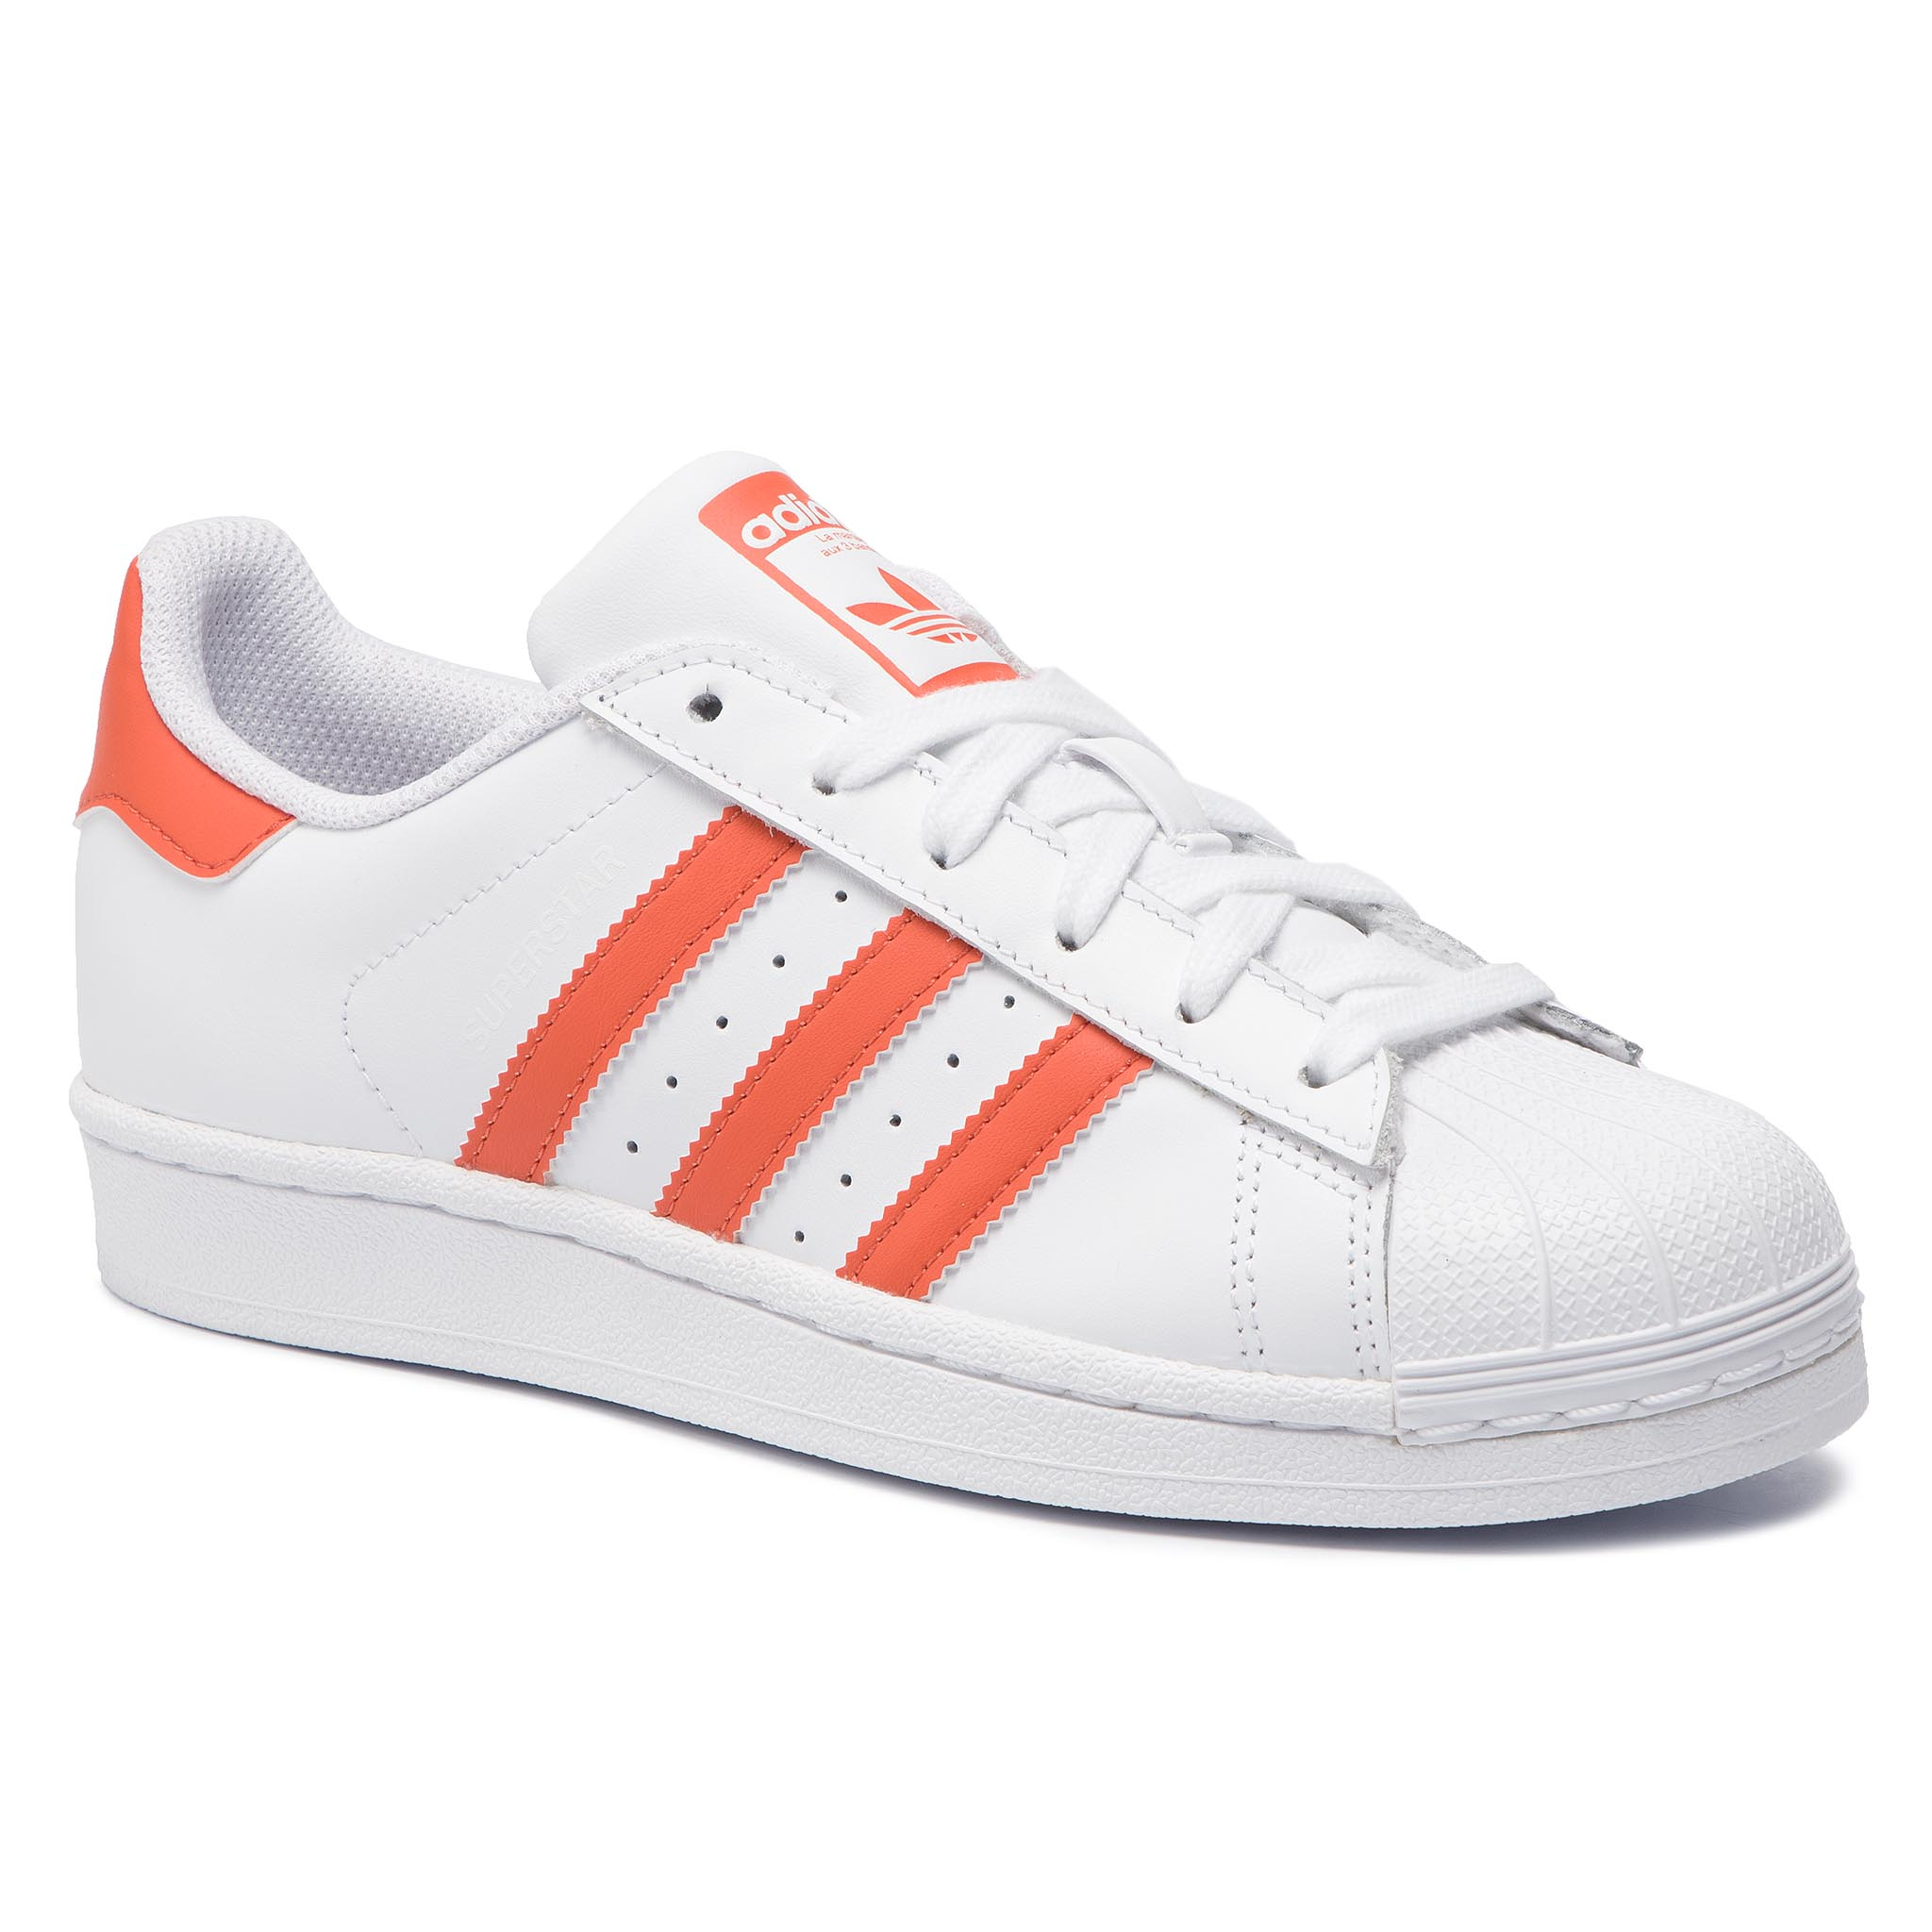 Adidas Ftwwhthiregrgoldmt Superstar B41995 Shoes Sneakers RL34A5jq